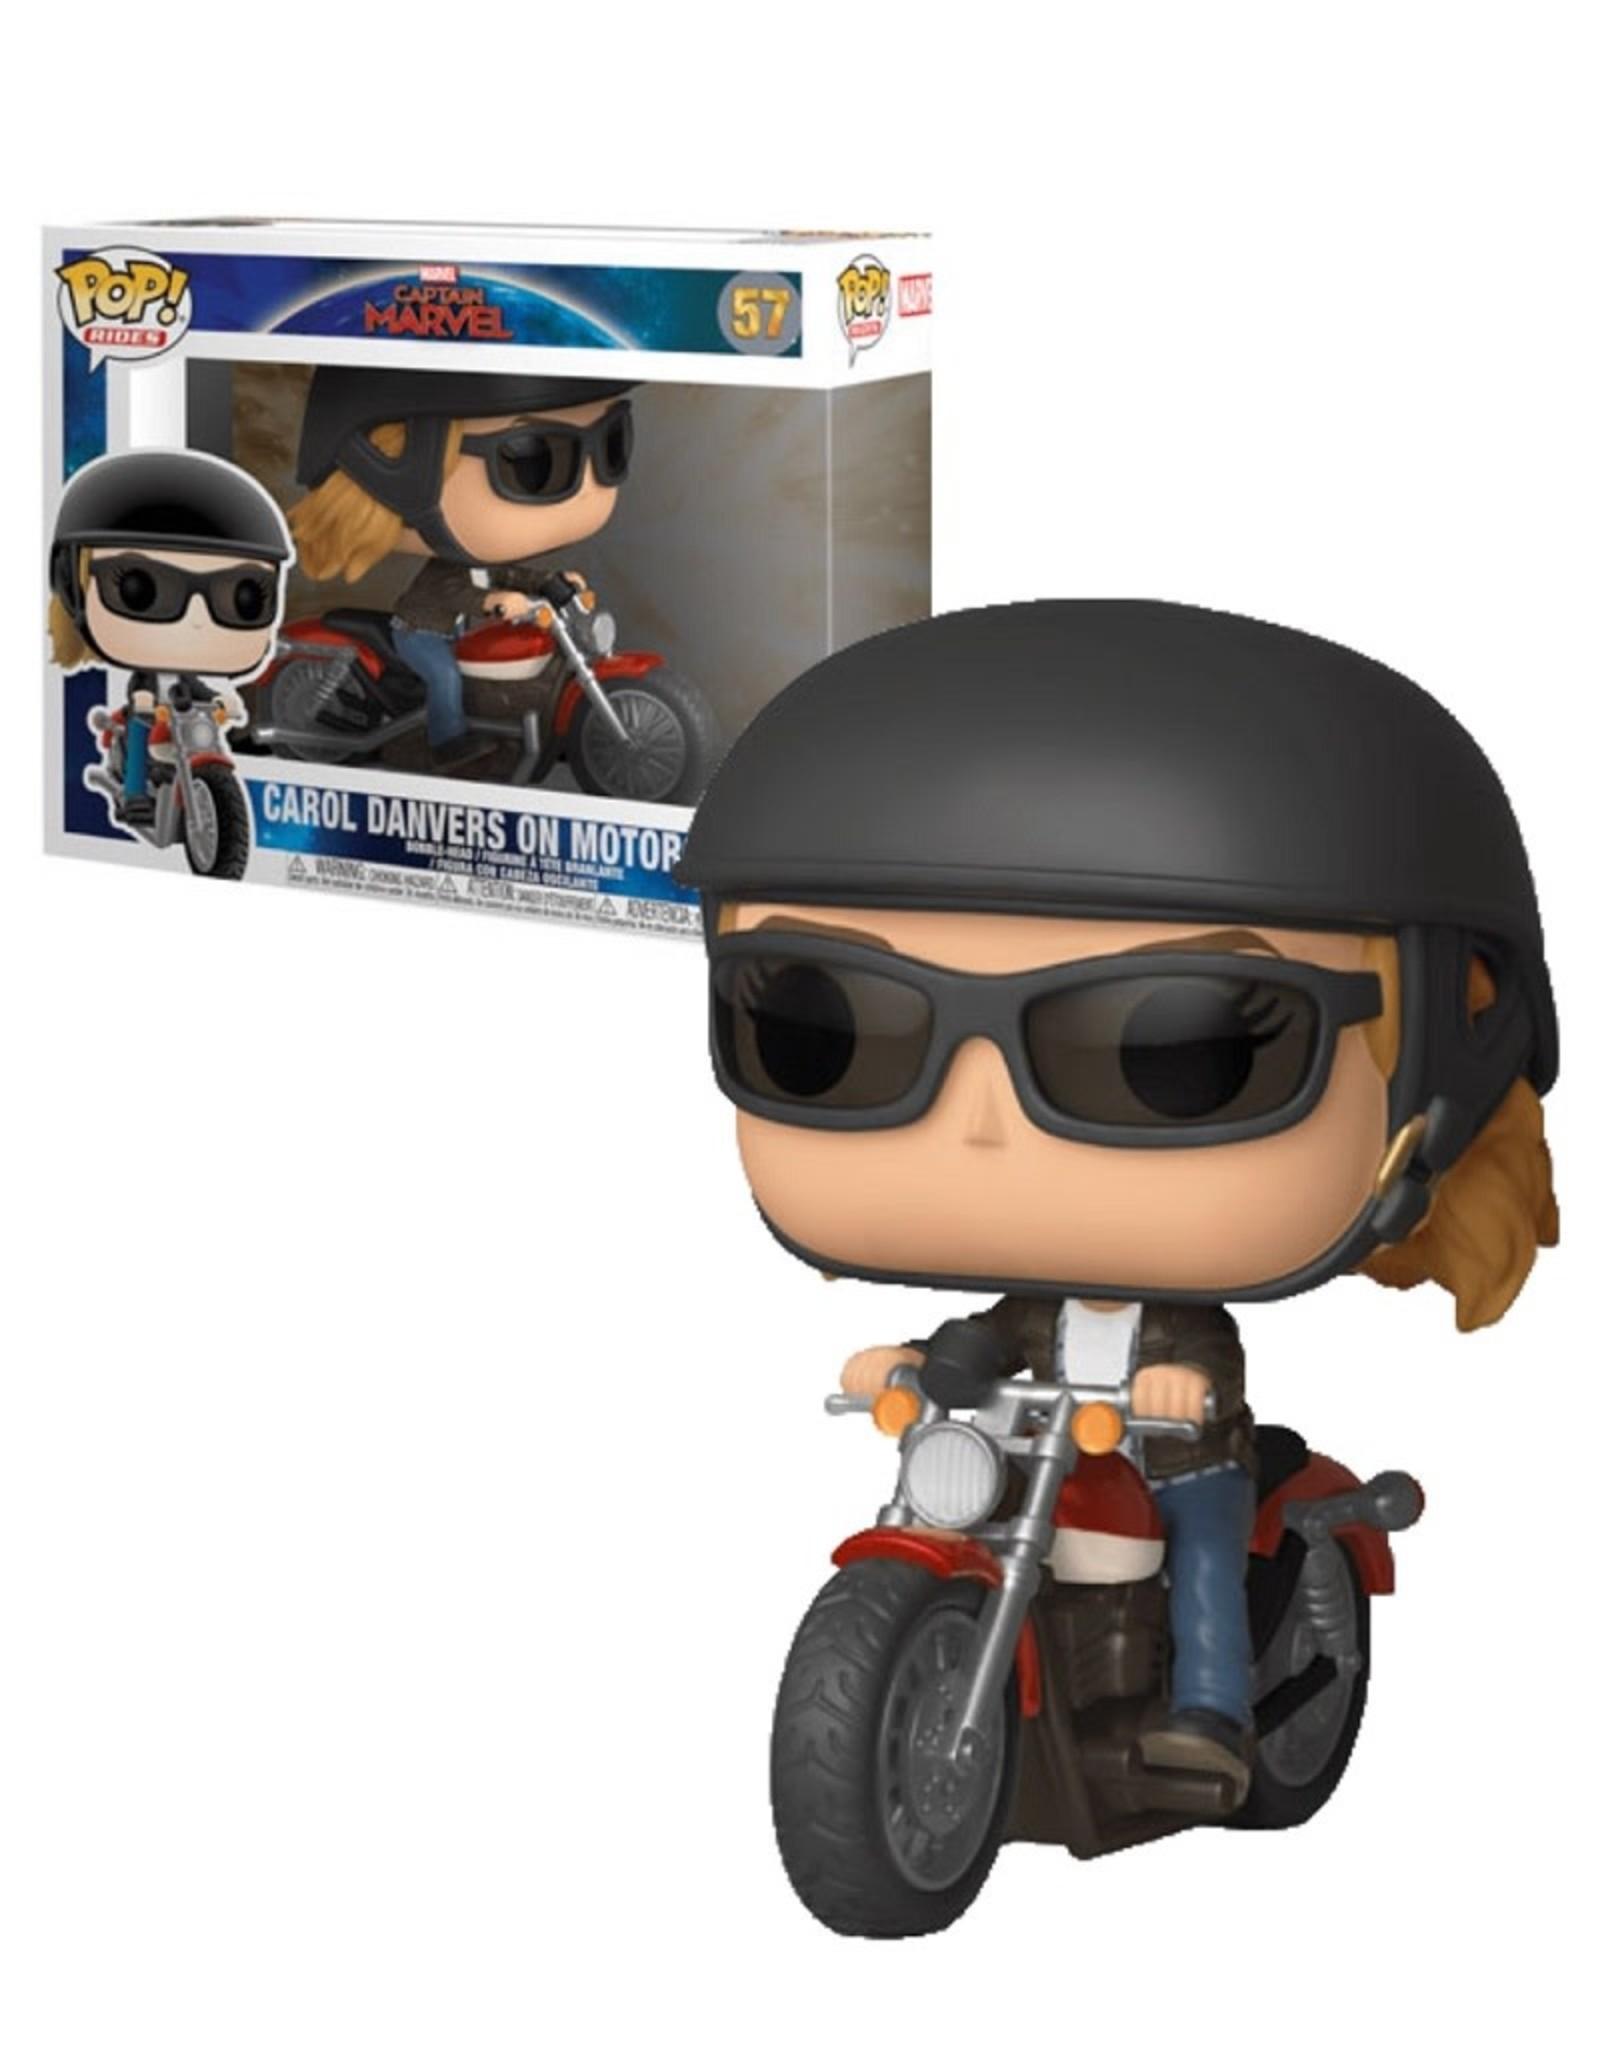 Marvel Captain Marvel 57 ( Funko Pop ) Carol Danvers On Motorcycle